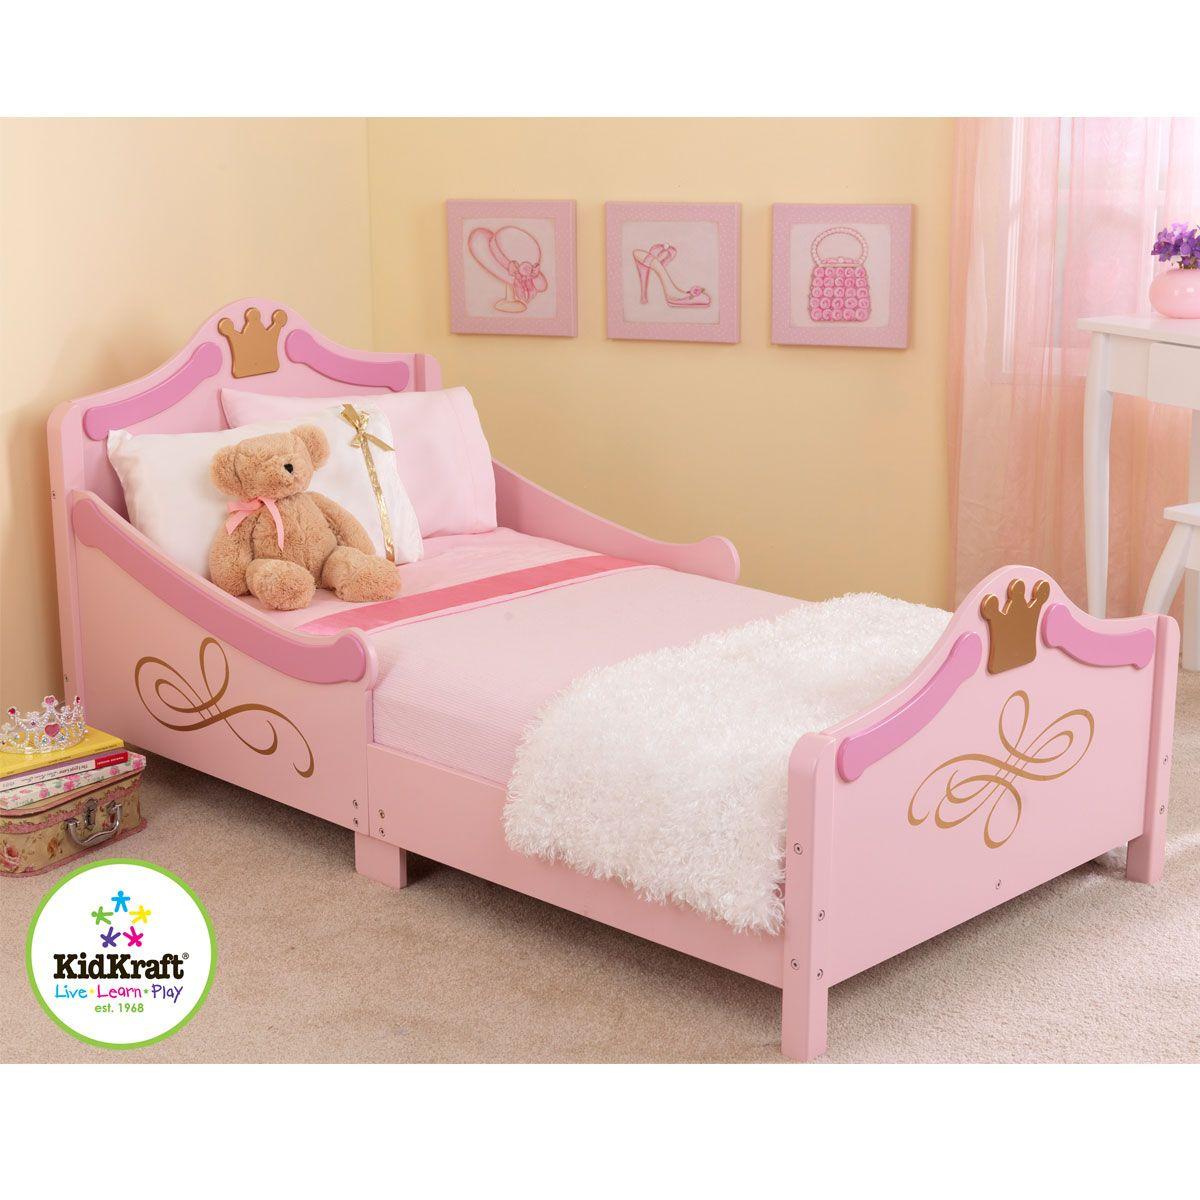 Kidkraft Prinzessin Kinderbett Kinderbett Design Kinderbett Und